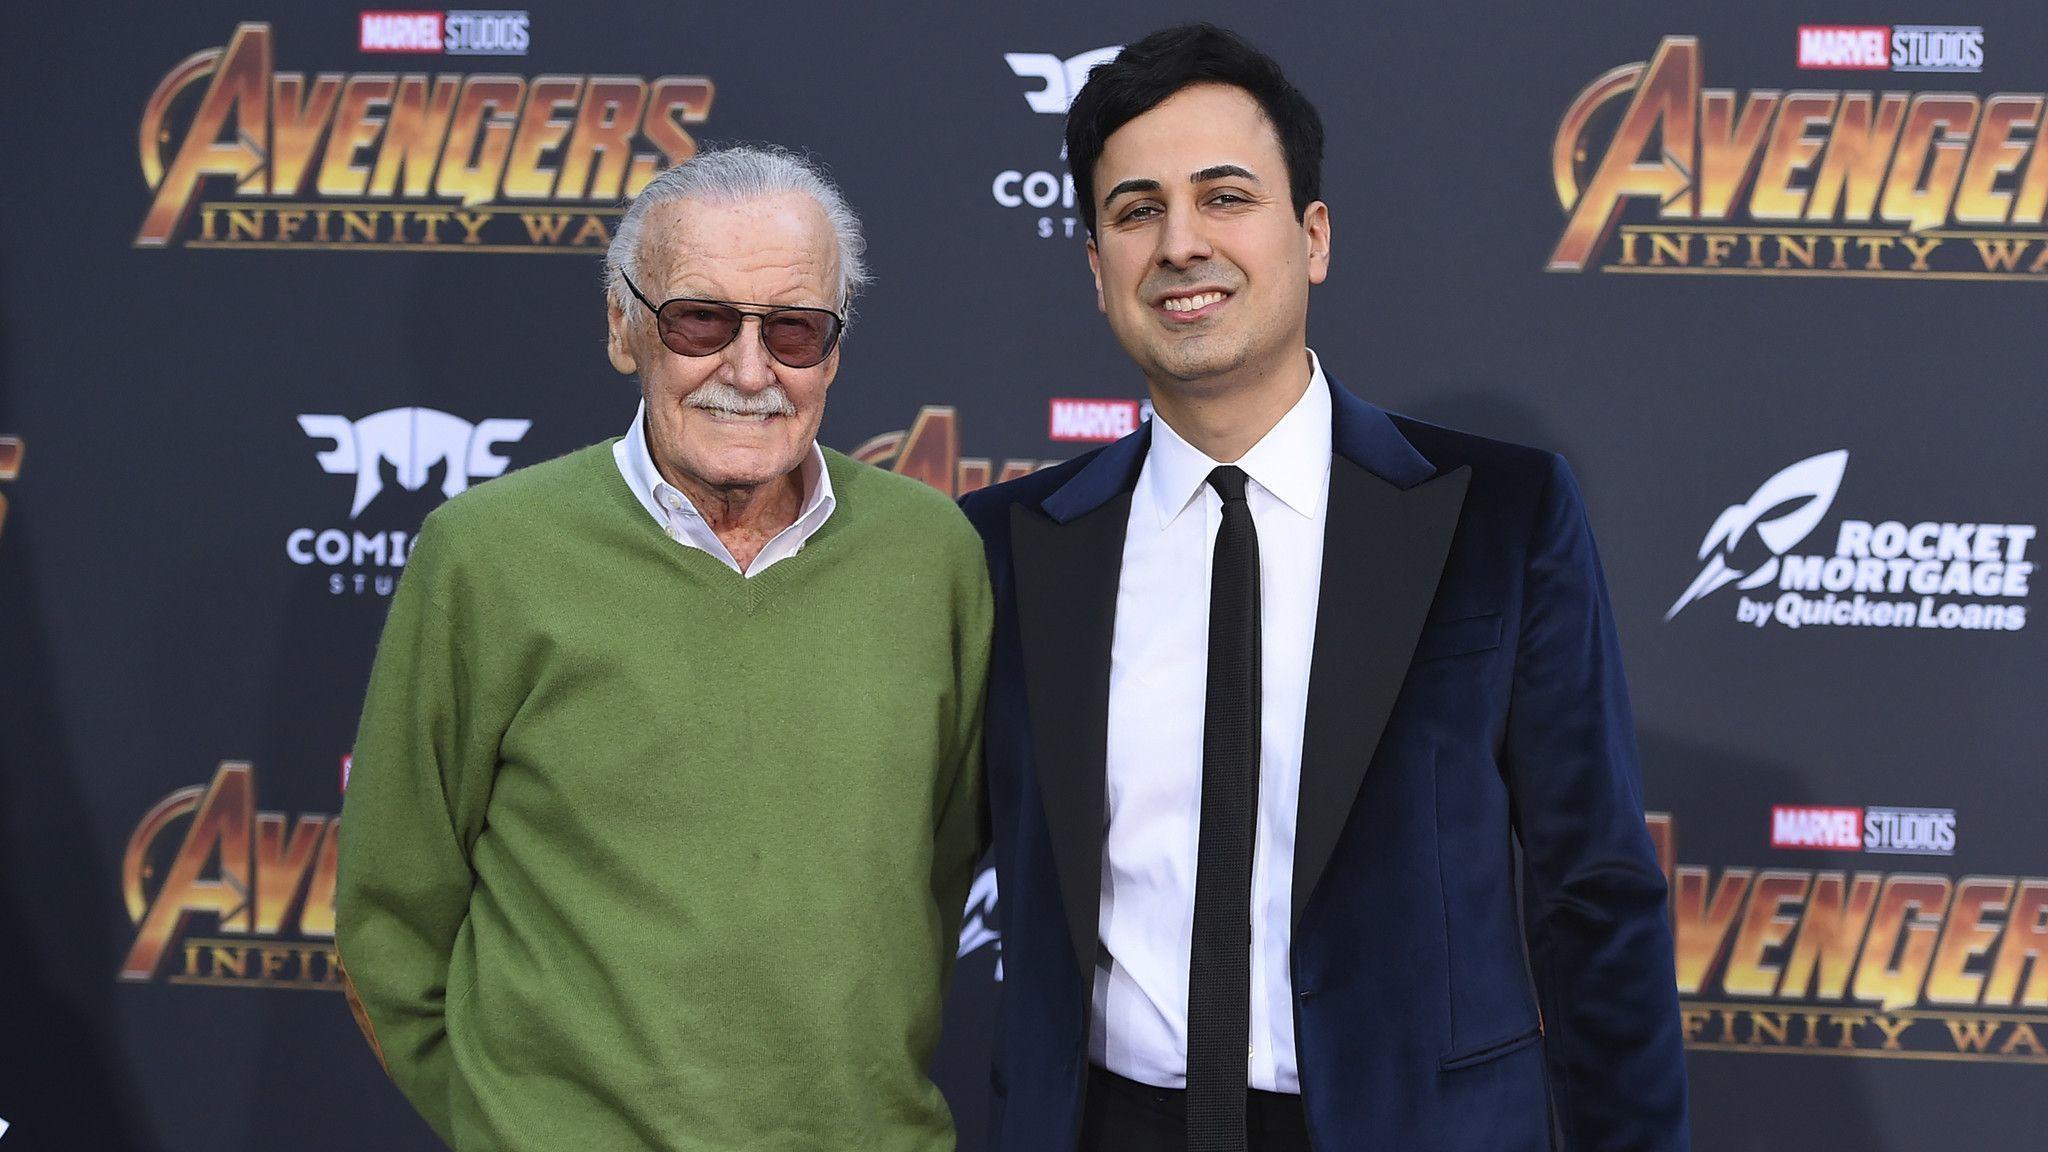 Police investigate reports of elder abuse against Marvel Comics legend Stan Lee